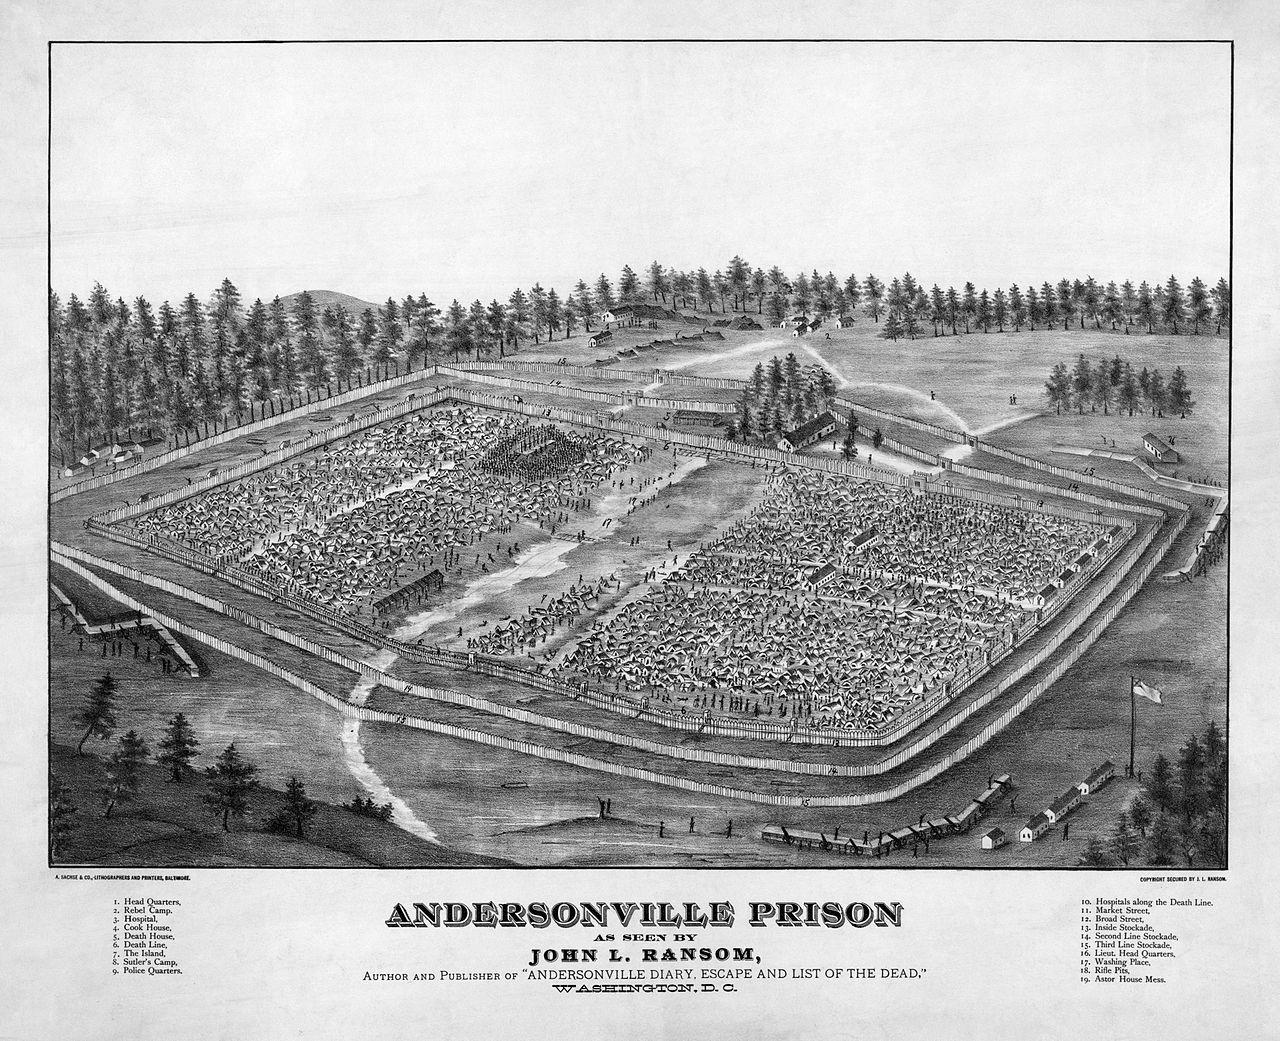 Andersonville Prison - American Civil War prison camps - Wikipedia, the free encyclopedia